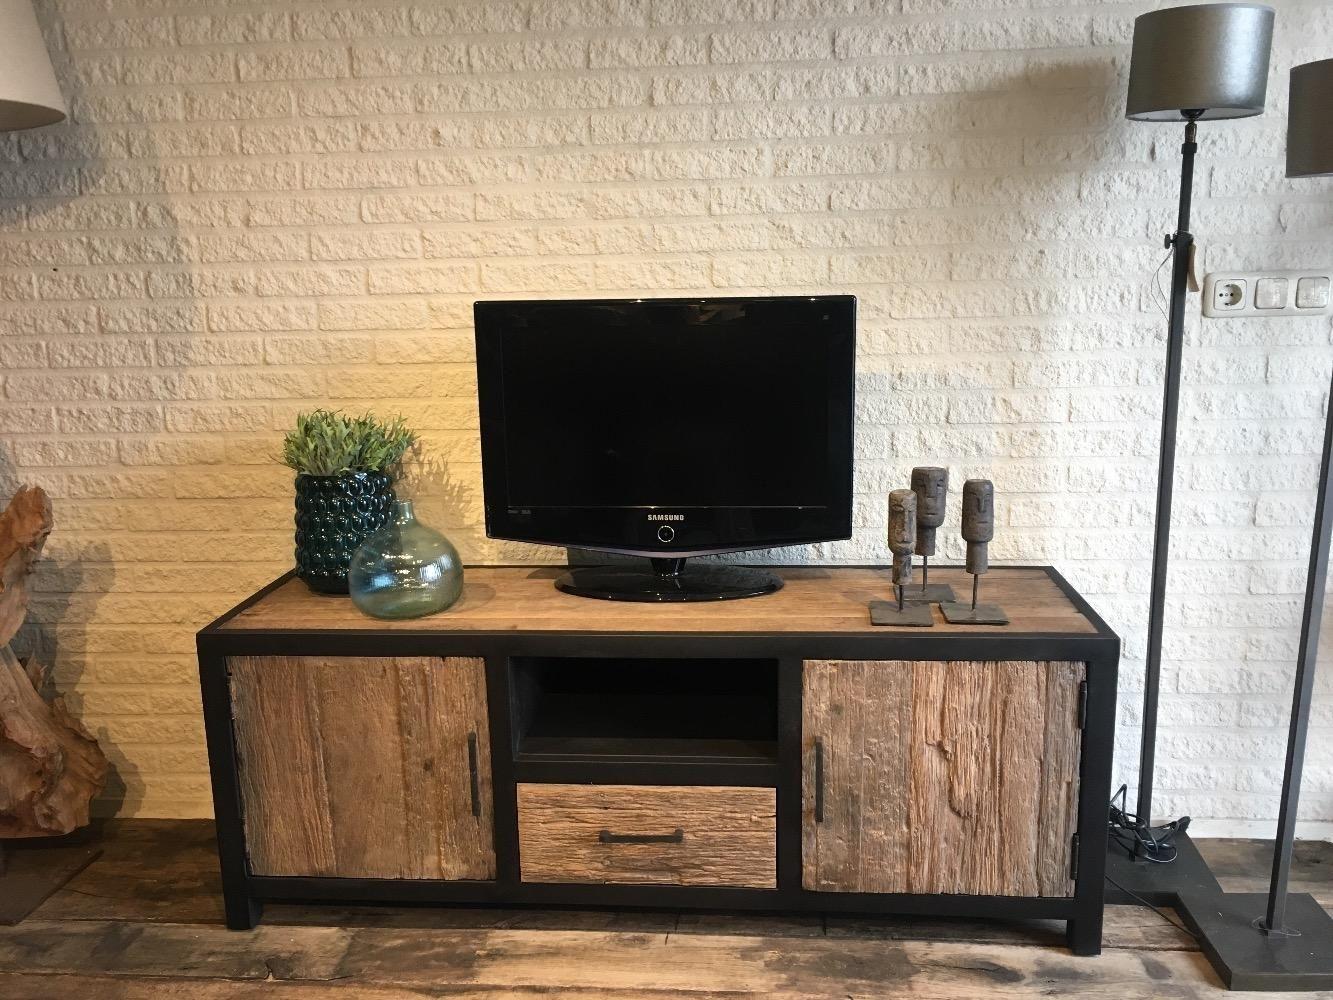 Tv Meubel Van Hout En Staal.Tv Meubel Oud Hout Staal Kasten Onz Thuys Interieur In